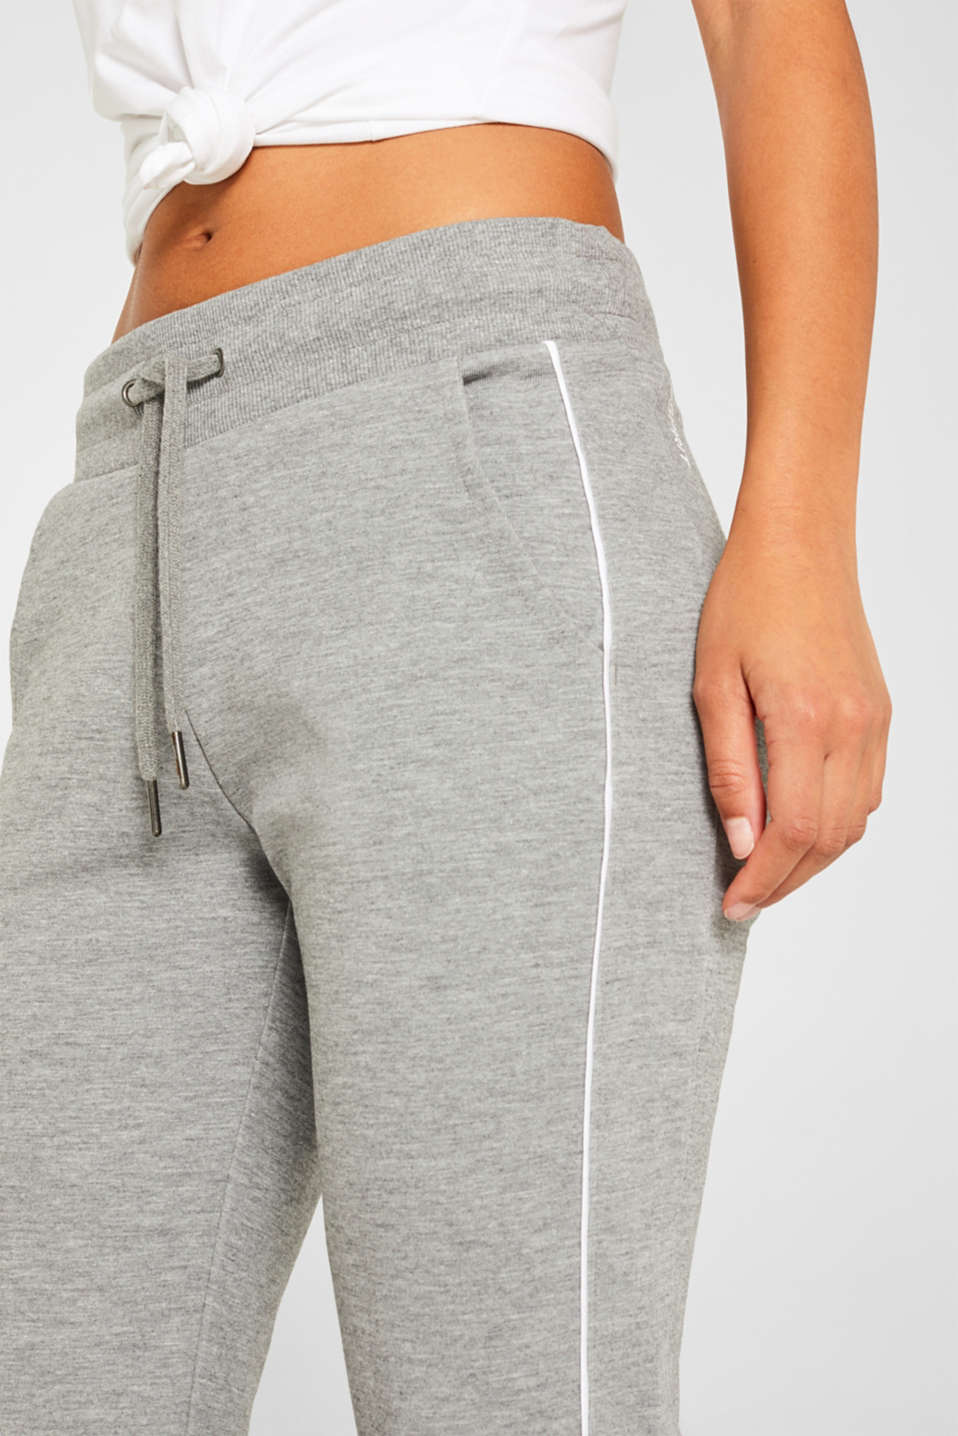 Pants knitted, MEDIUM GREY 2, detail image number 2